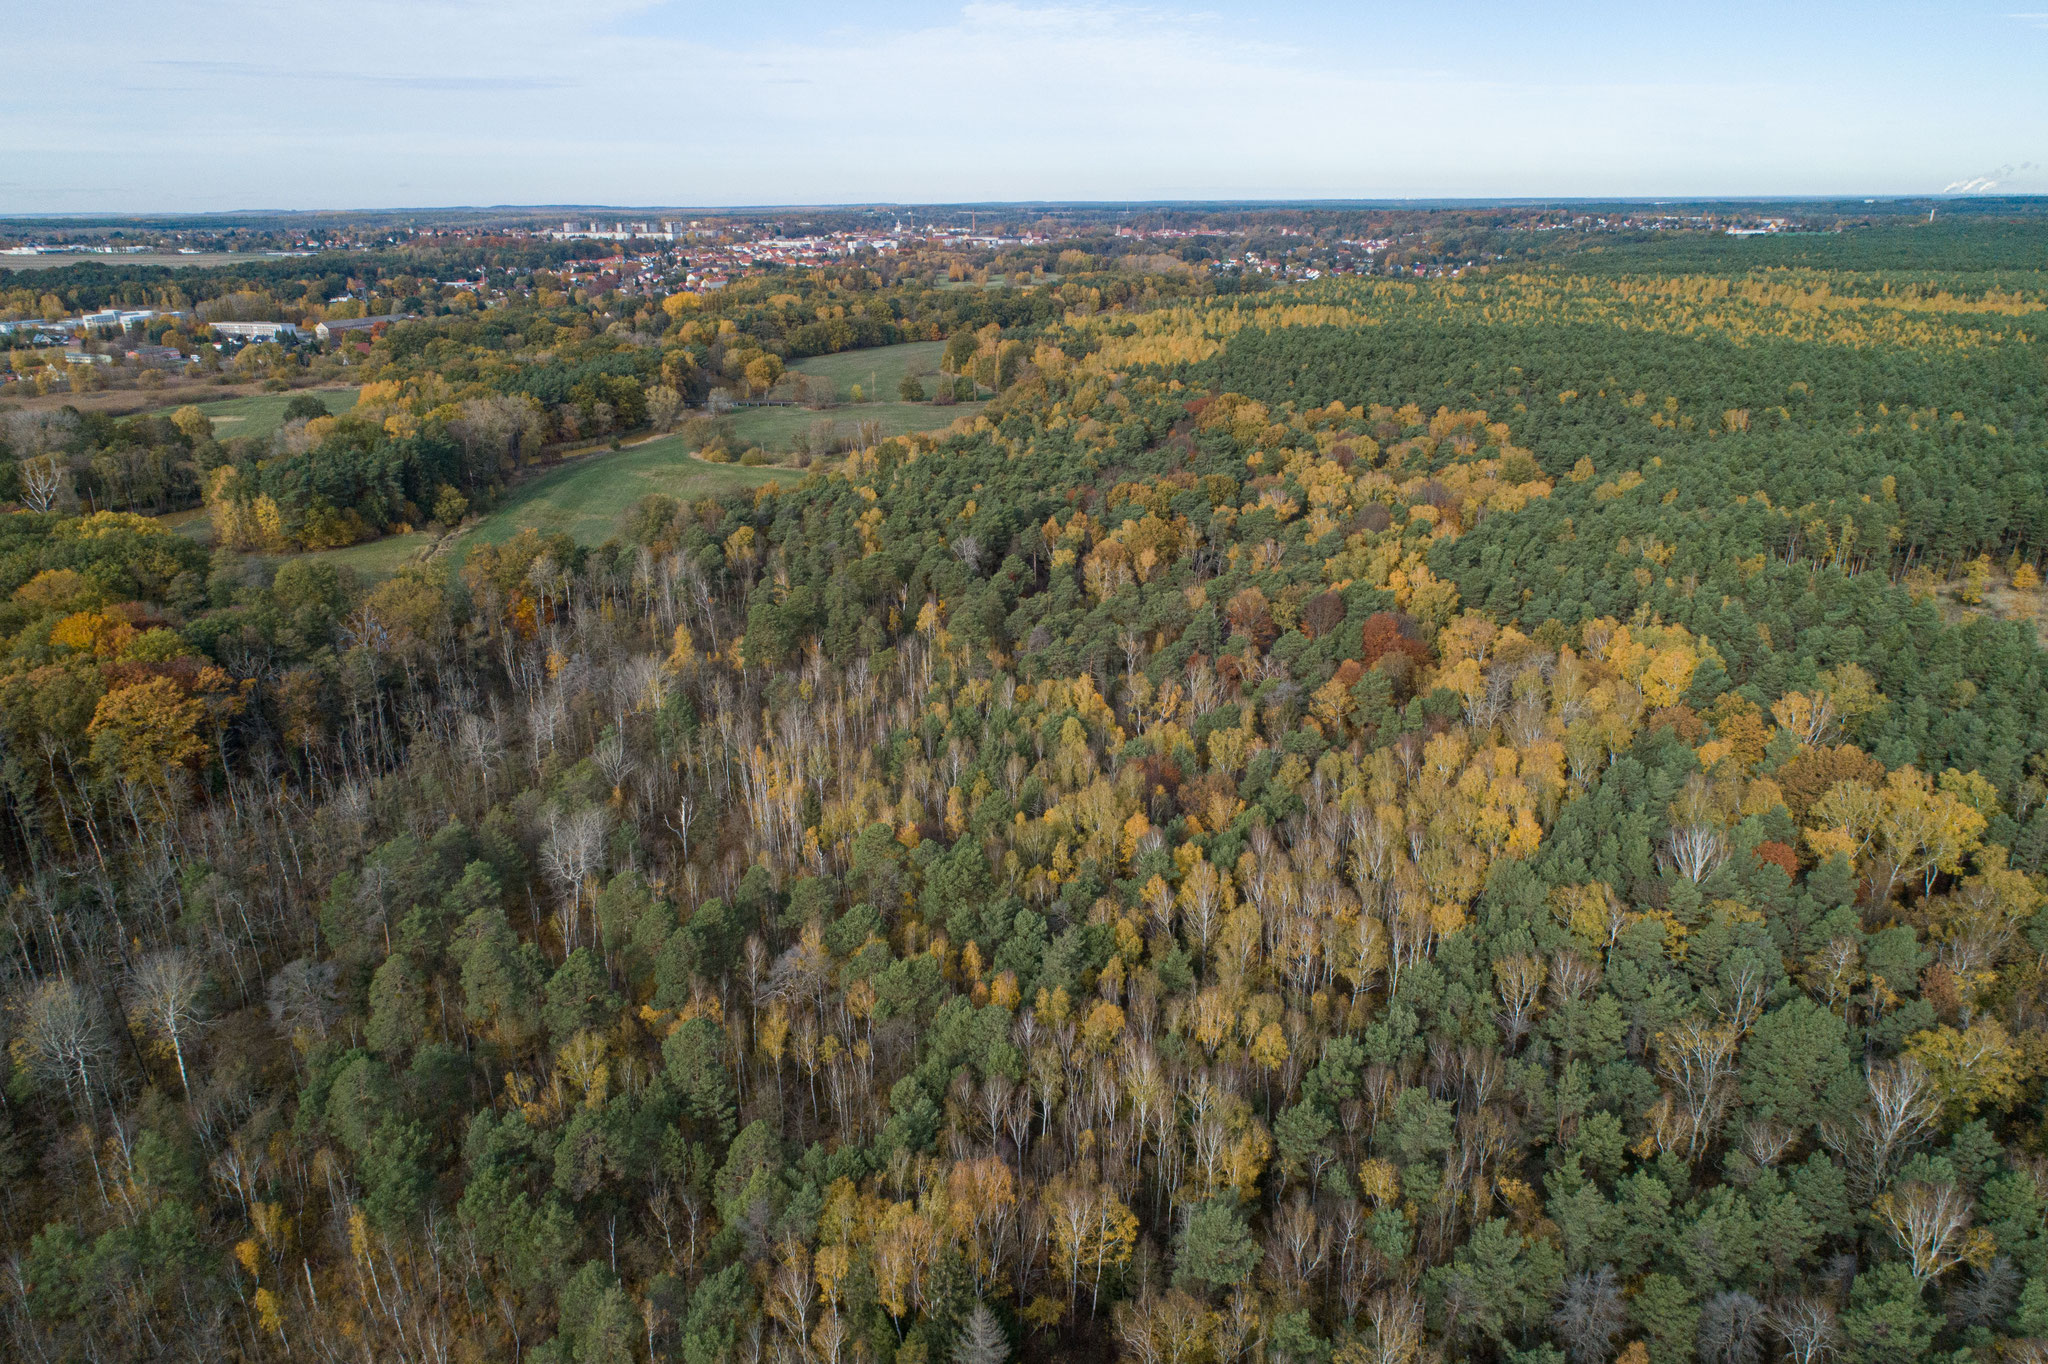 Luftaufnahme vom Naturpark Slamener Kuthen:  Foto von Lennert Piltz